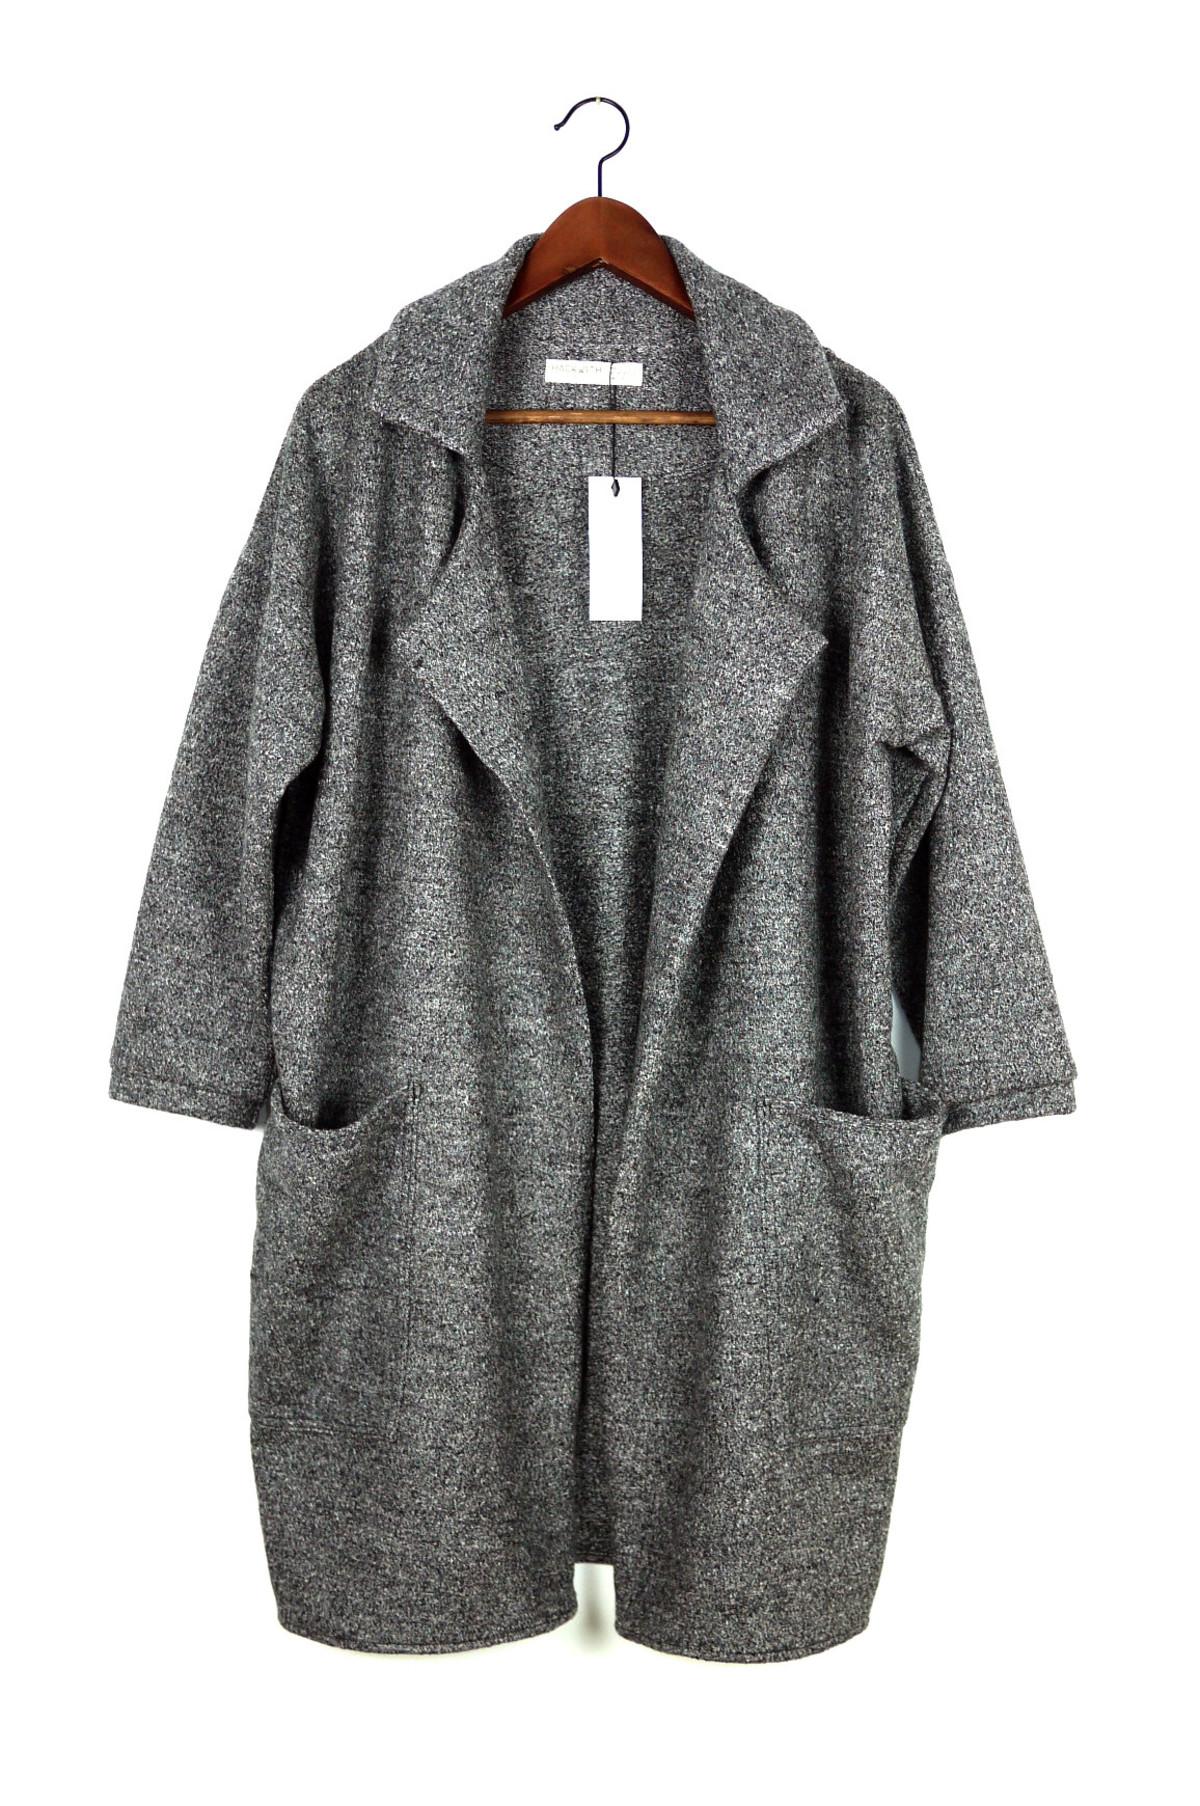 House design jacket - Sizes M Xl